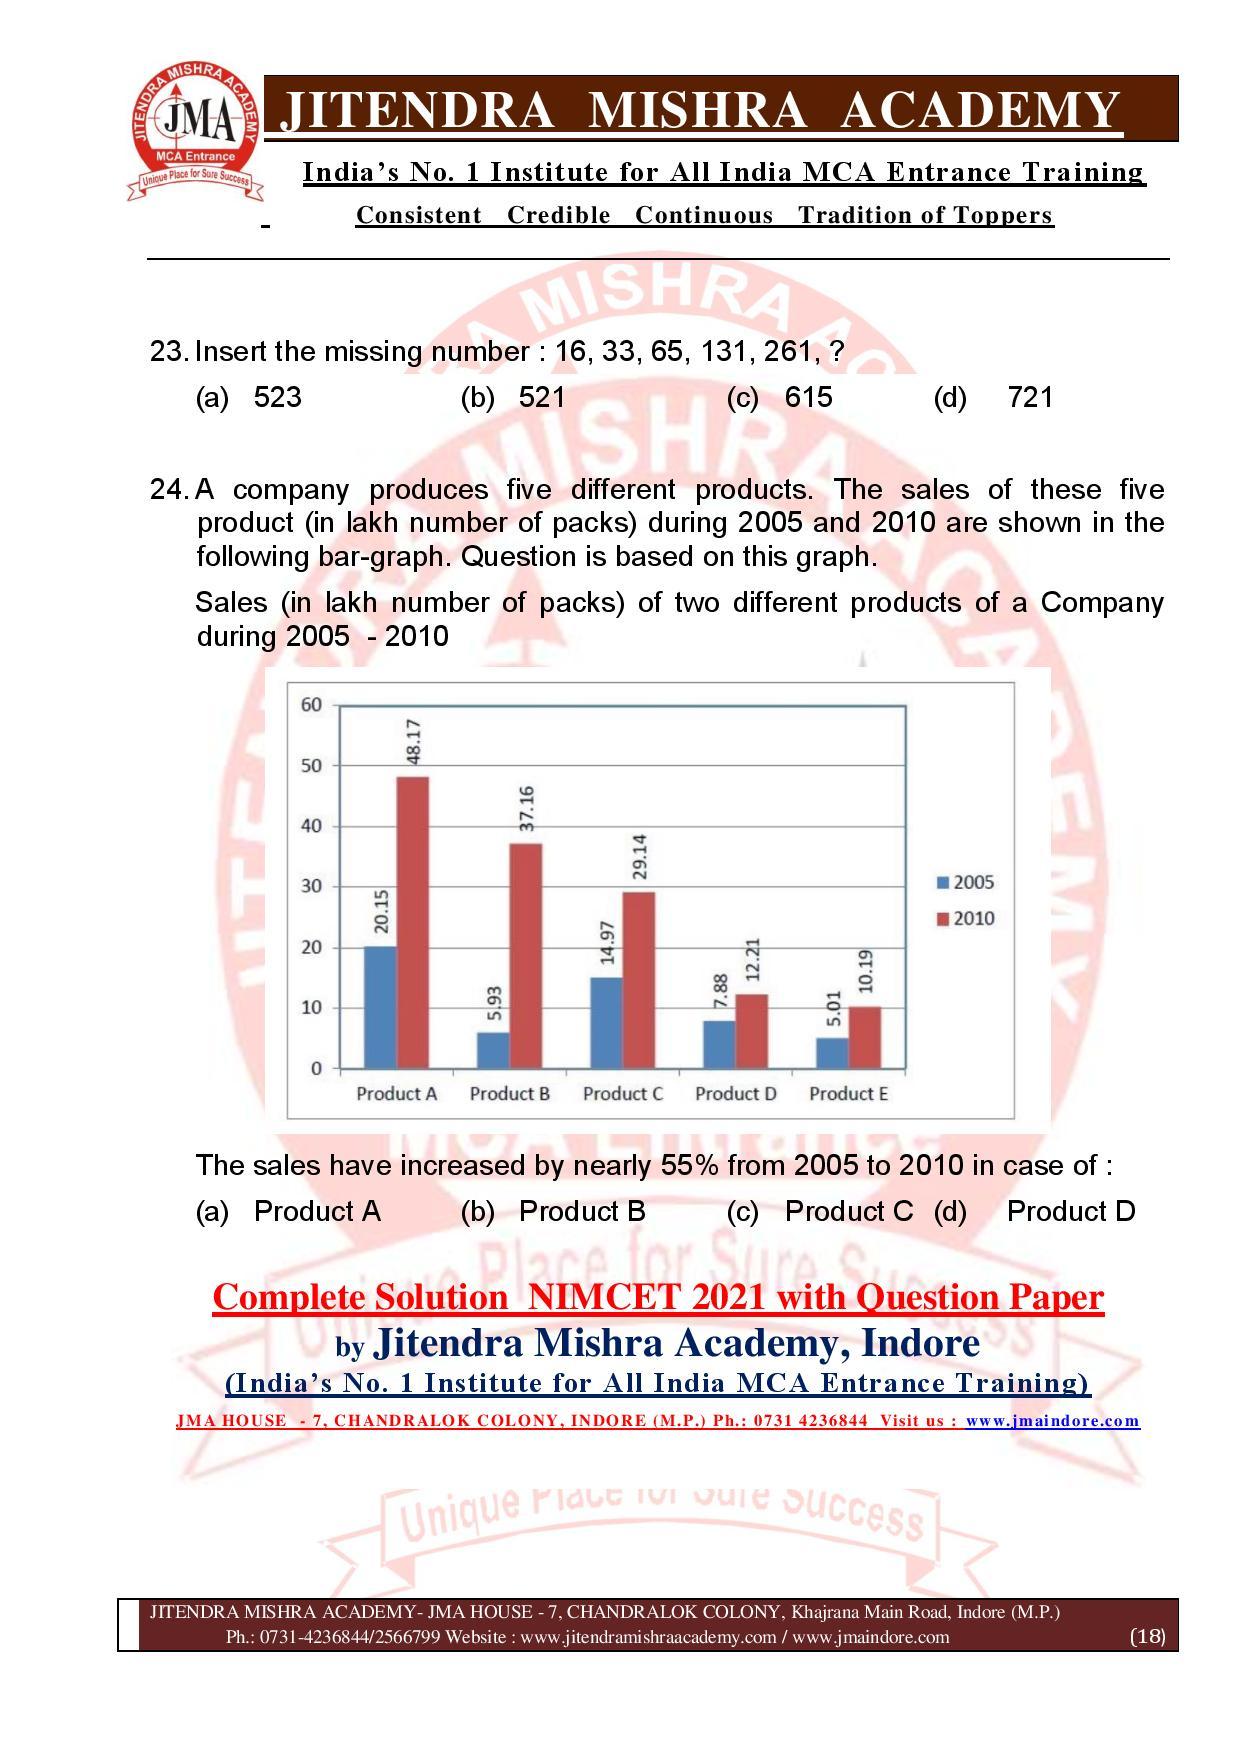 NIMCET 2021 QUESTION PAPER (F)-page-018